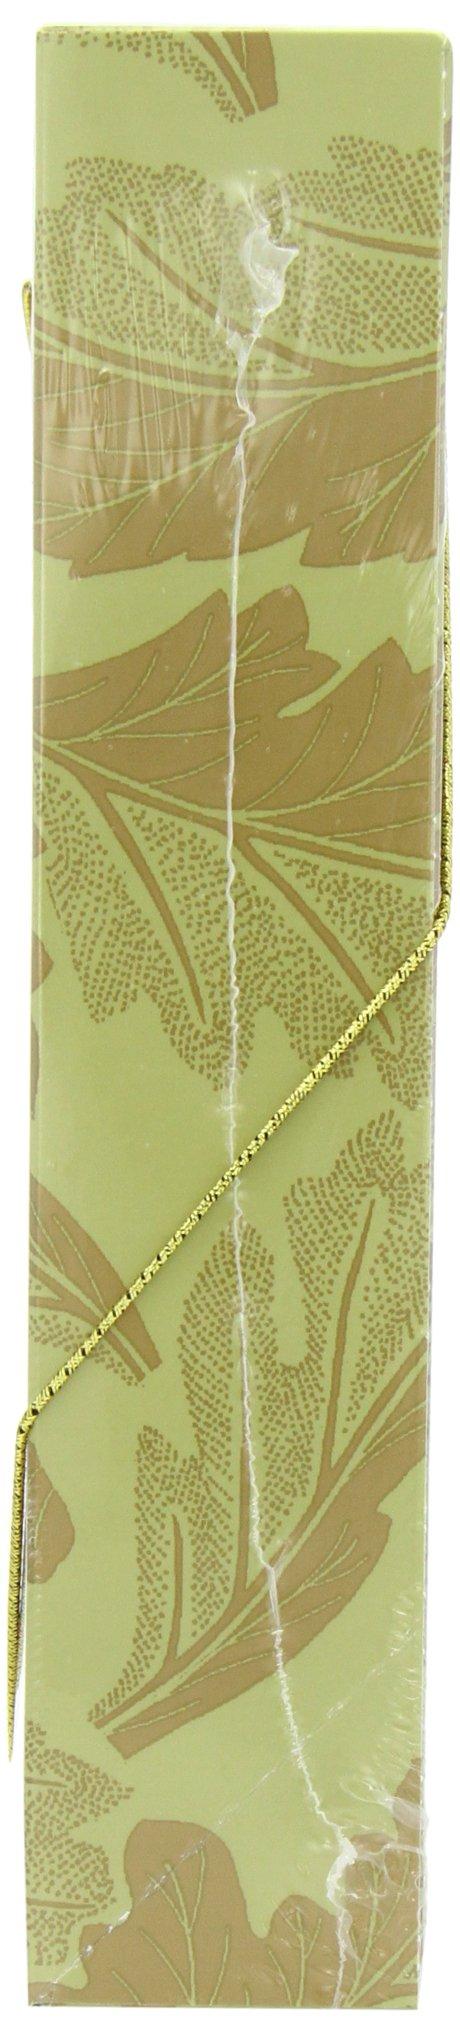 Stash Tea Gold Leaf Nine Flavor Gift Box by Stash Tea (Image #2)